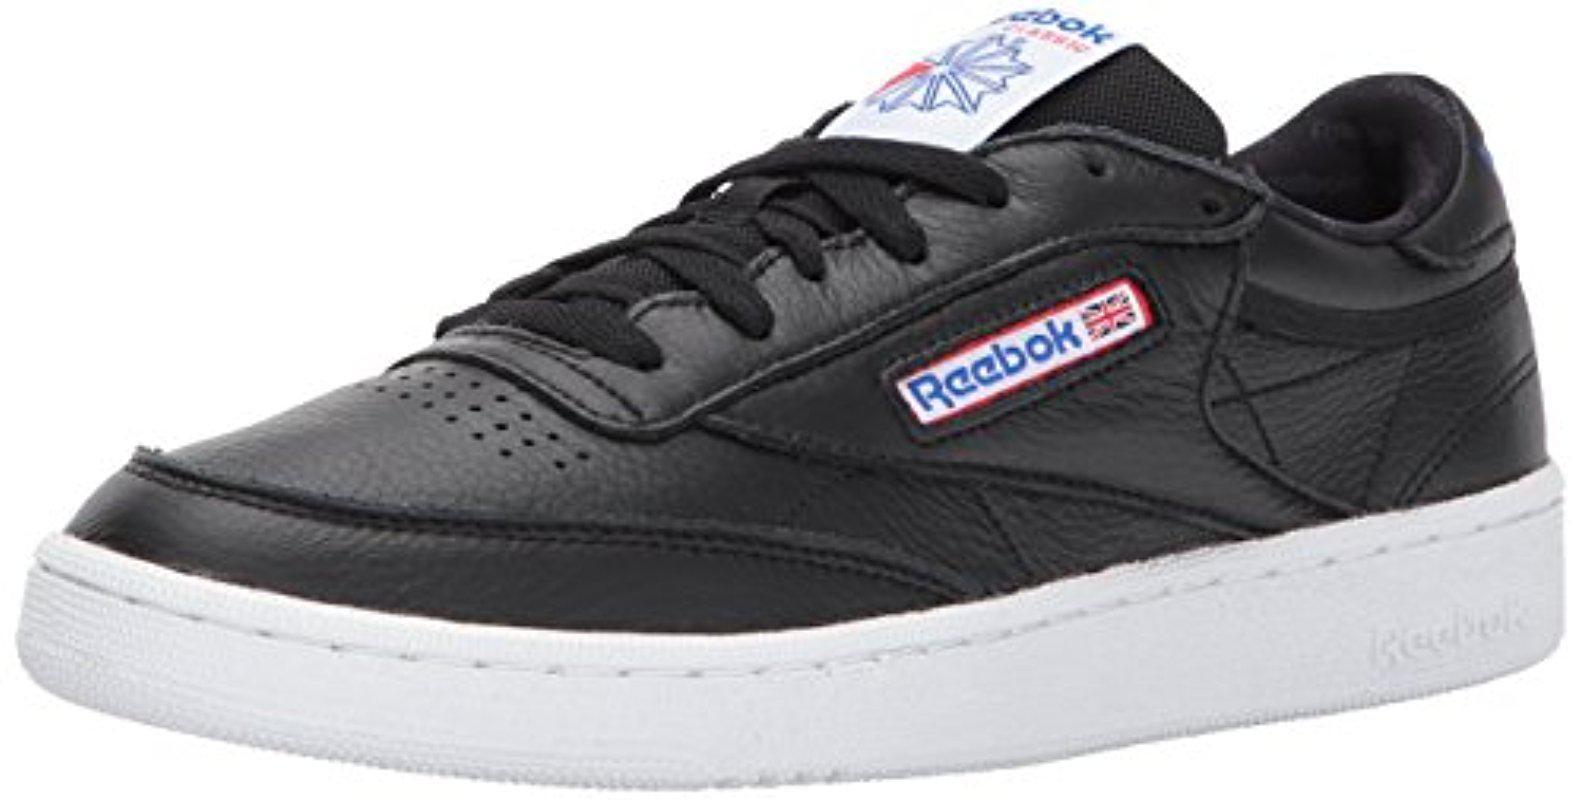 ead48a45d9b4 Lyst - Reebok Club C 85 Fashion Sneaker in Black for Men